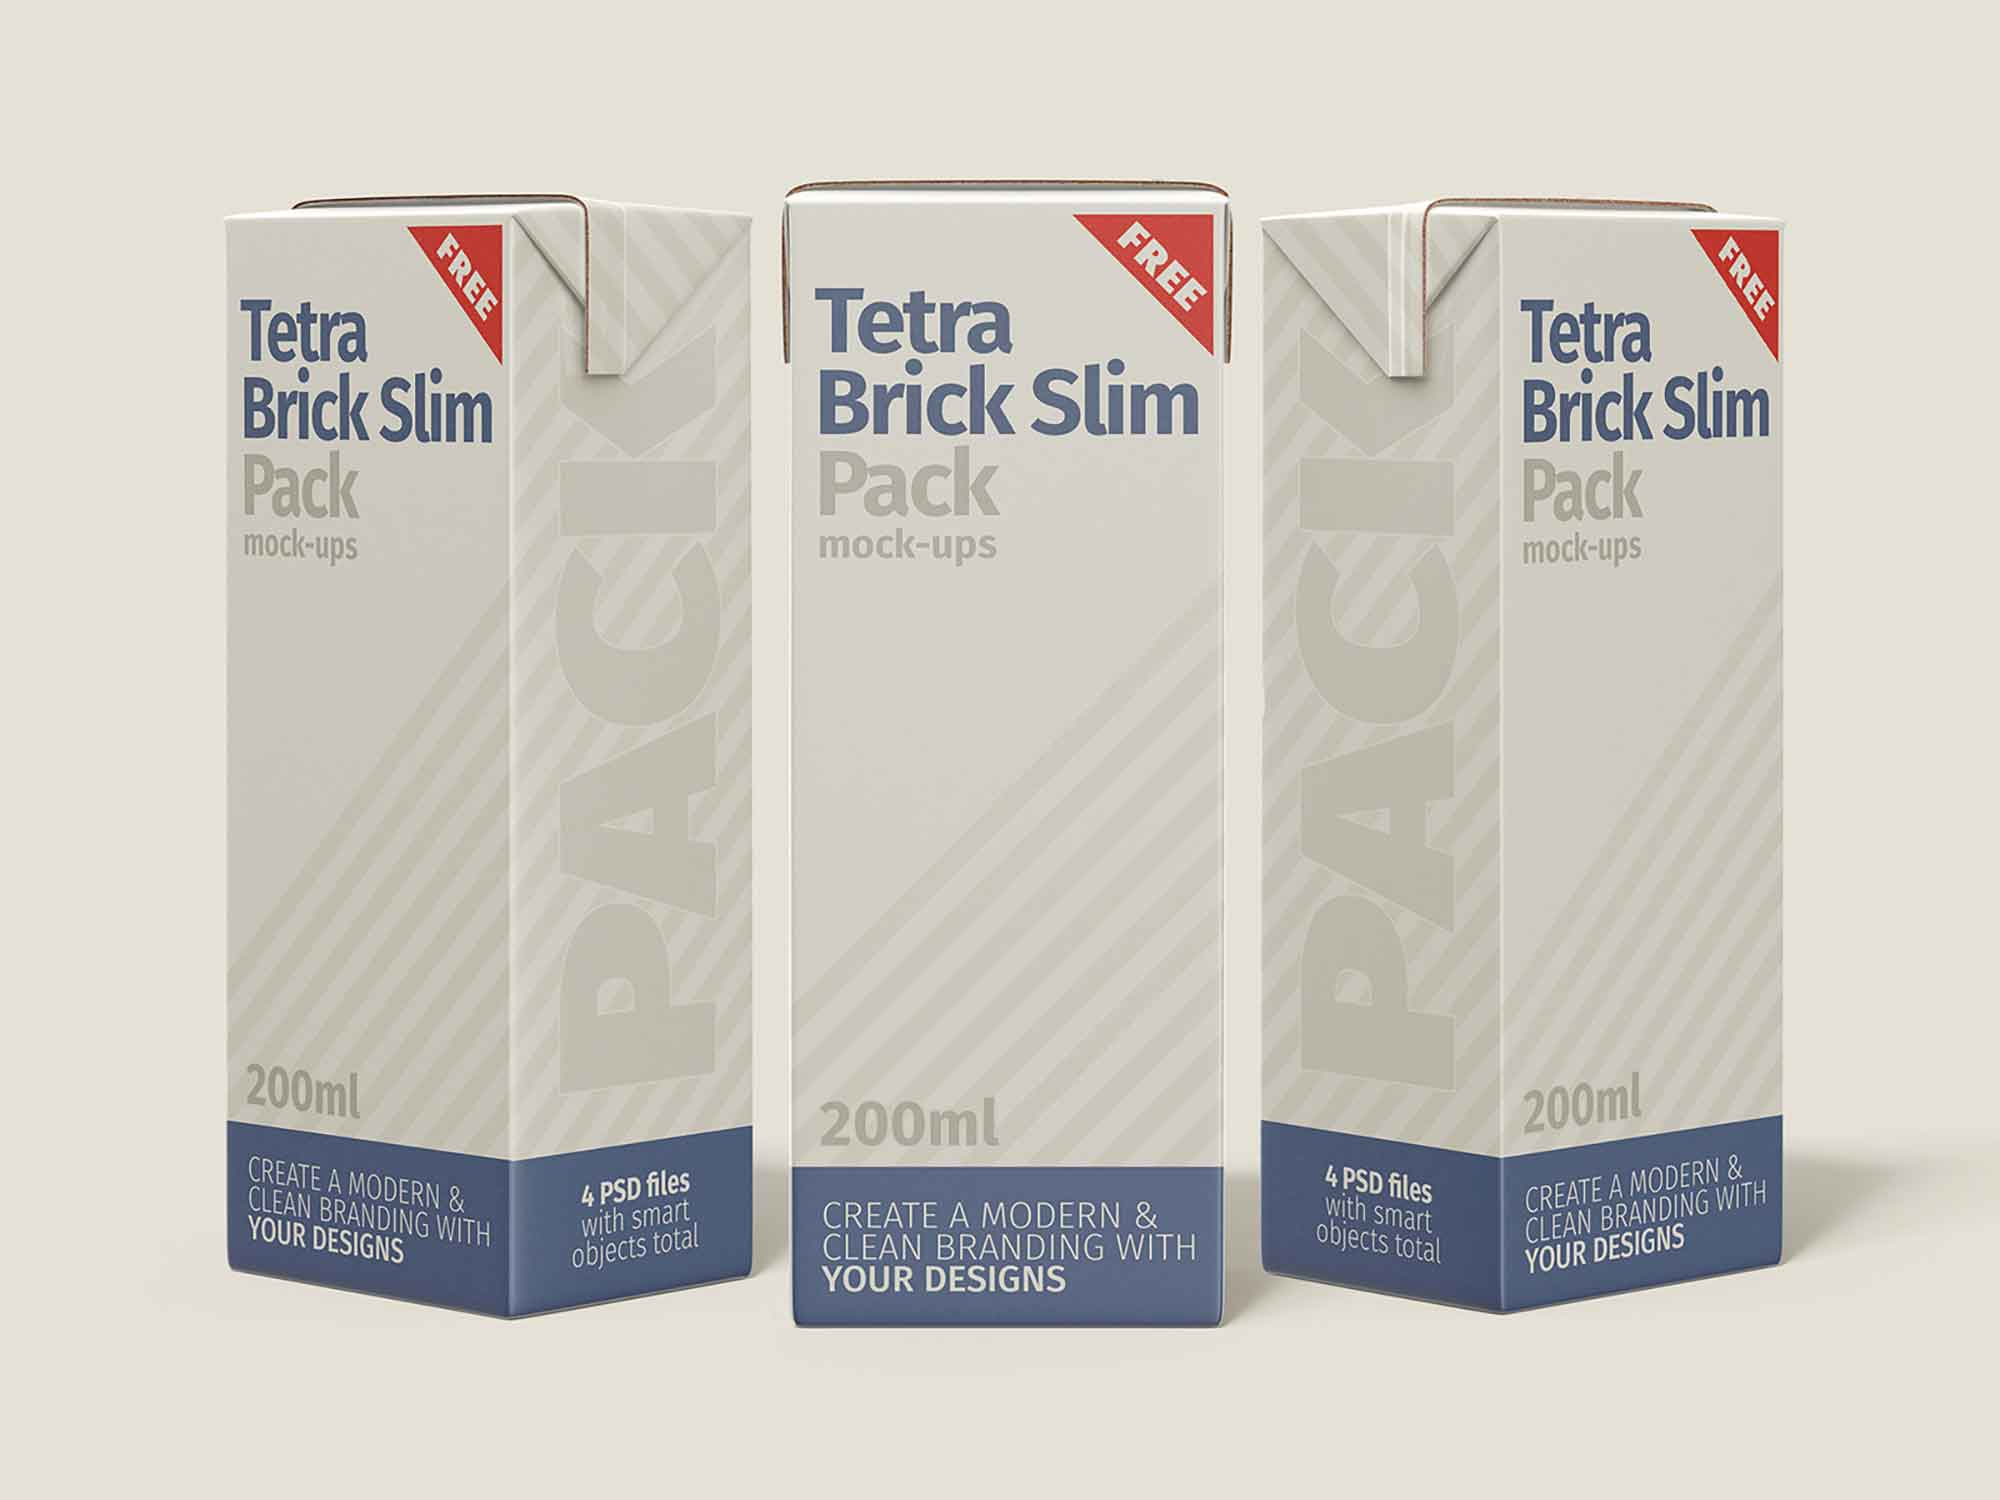 Tetra Brick Slim Mockups 3